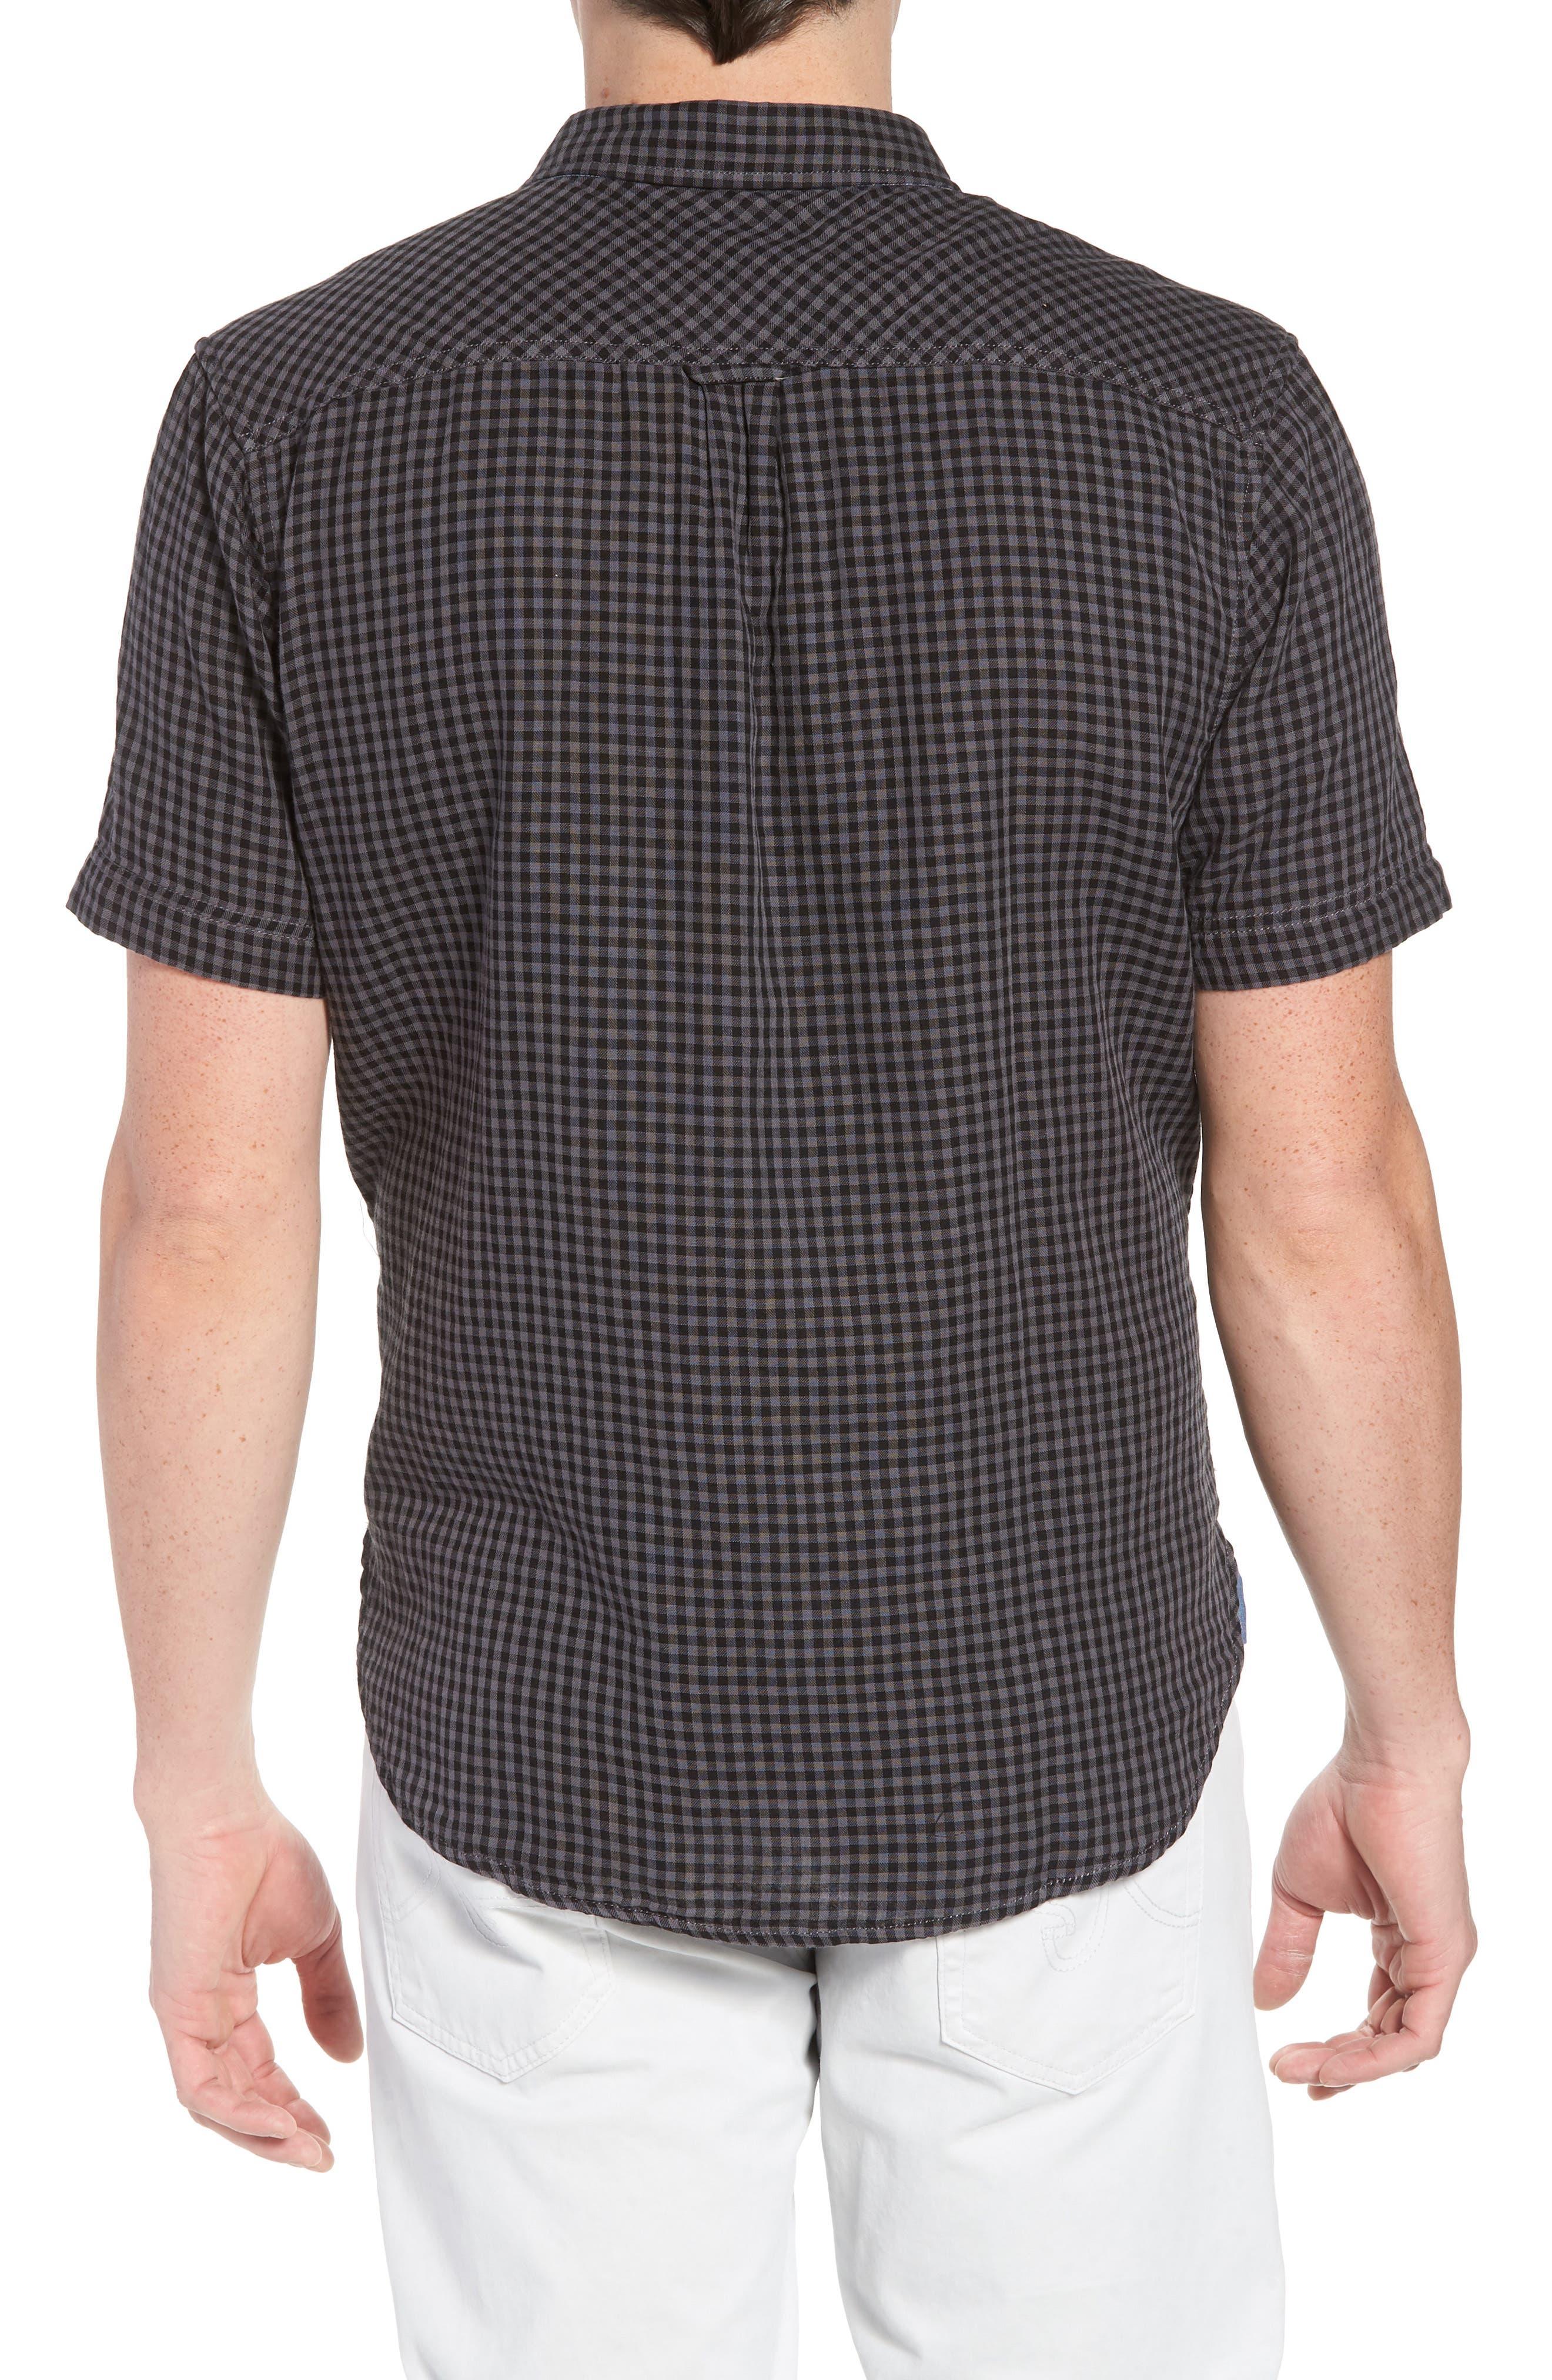 Soho Gingham Sport Shirt,                             Alternate thumbnail 3, color,                             Black Charcoal